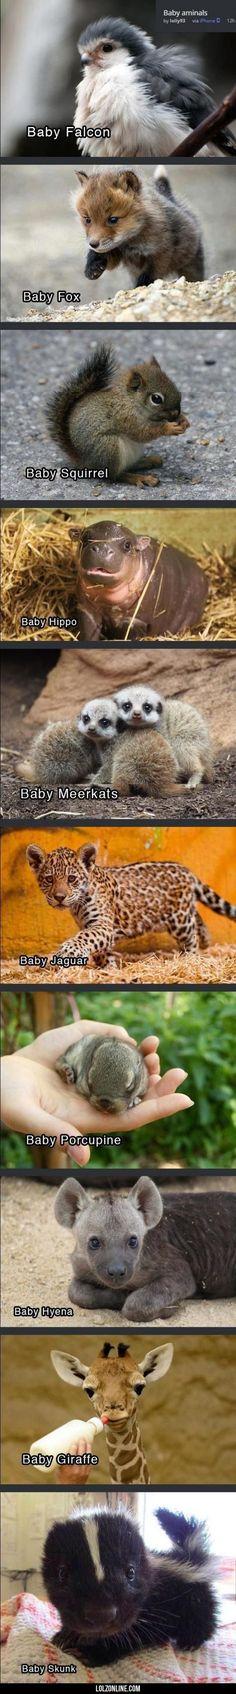 Baby's animal!